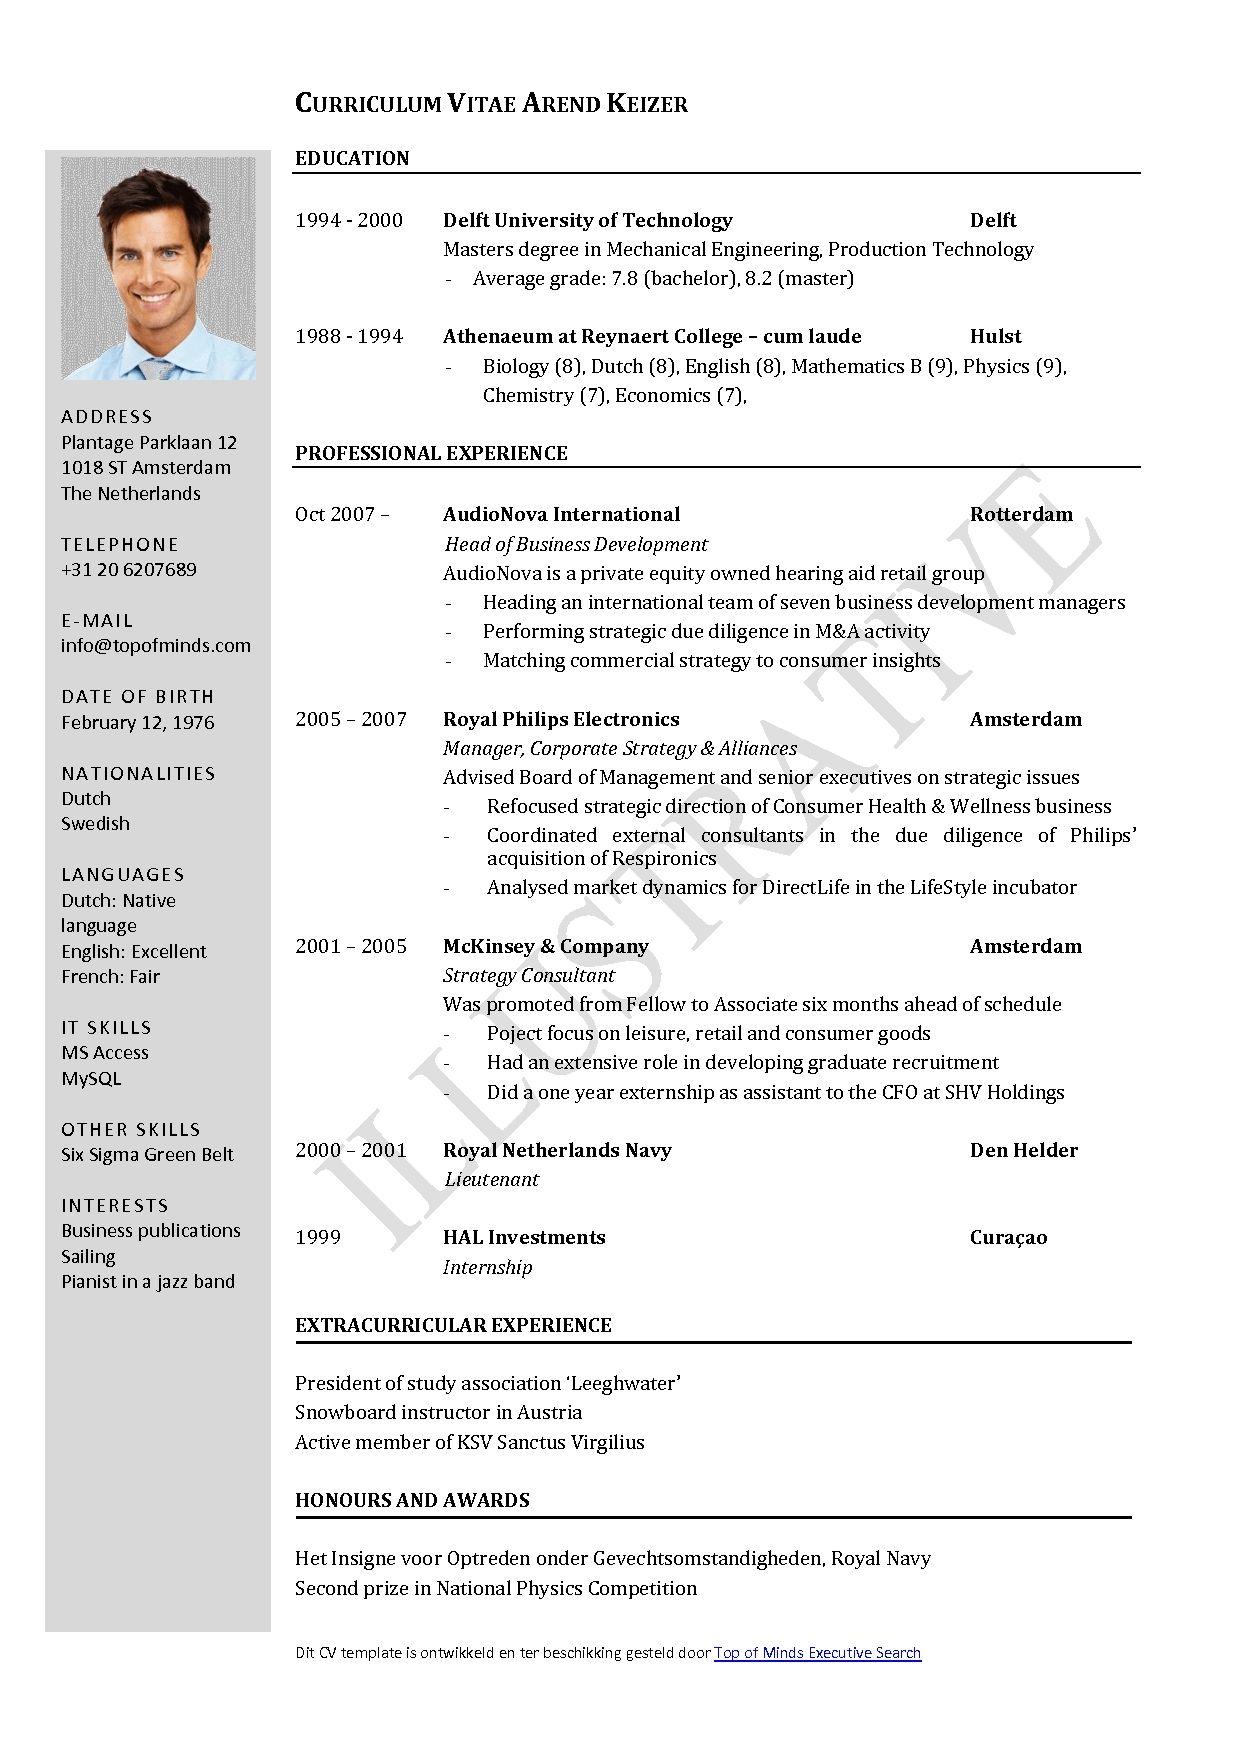 curriculum vitae template open office